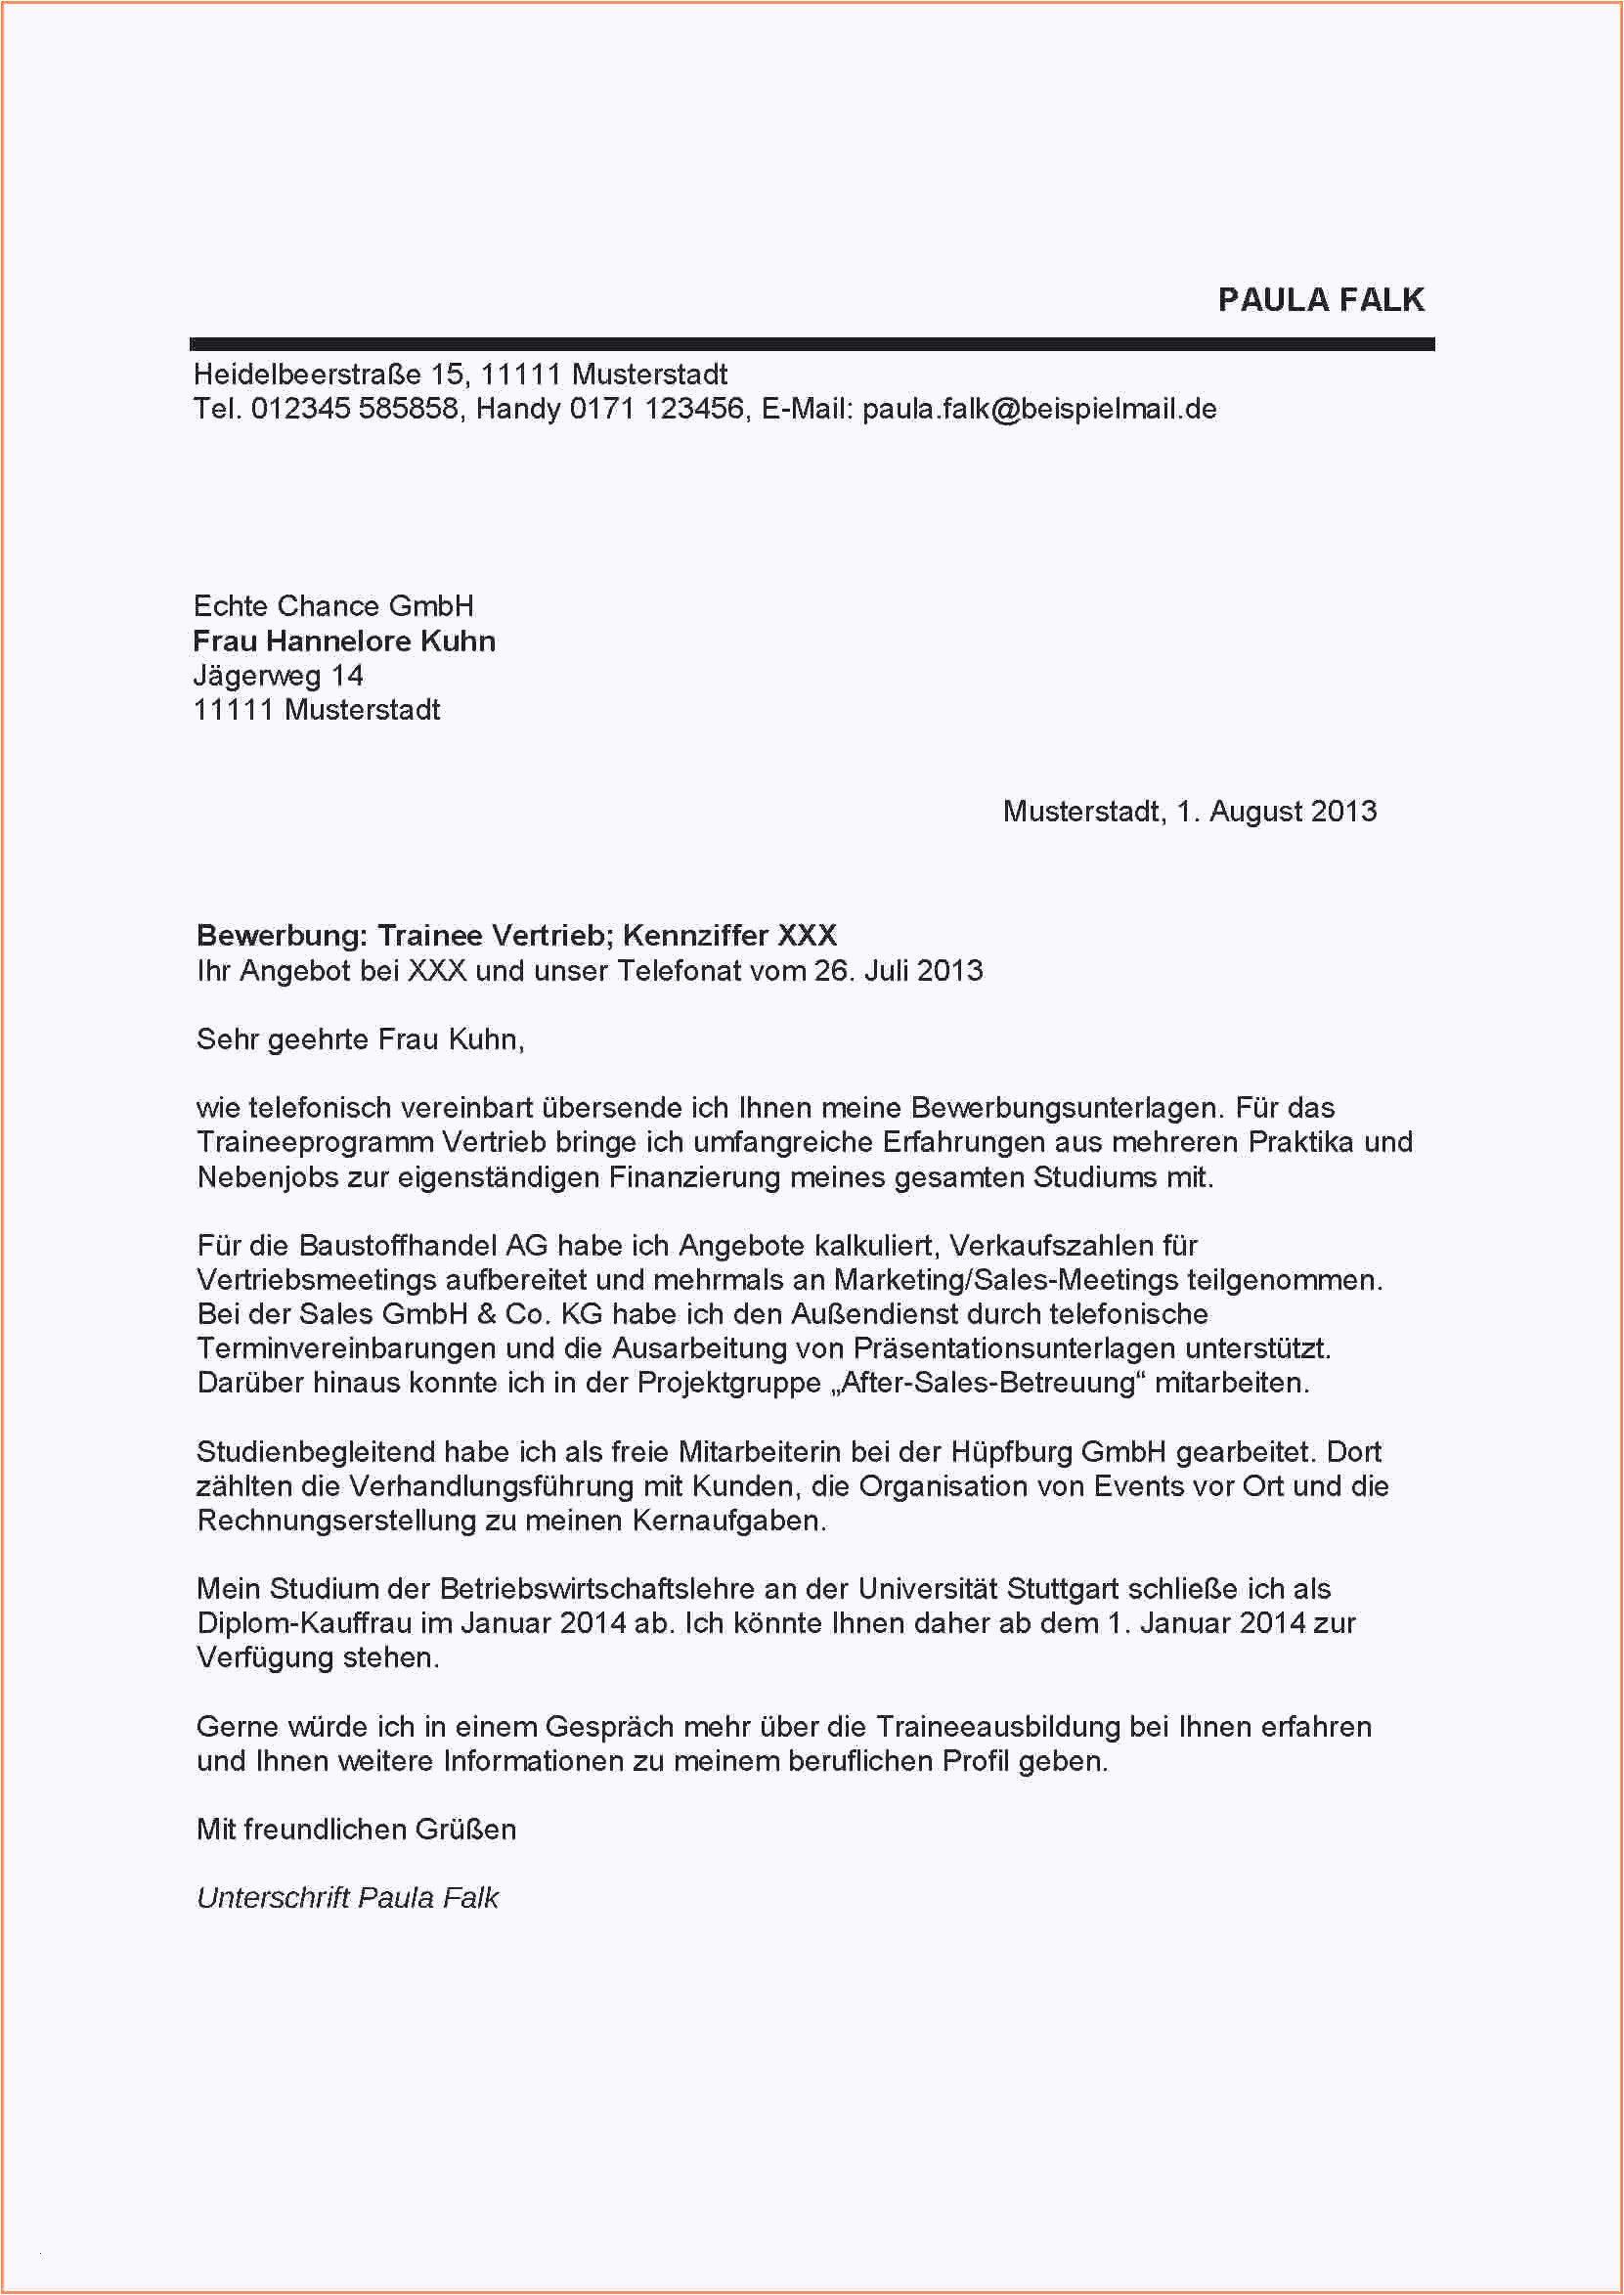 Lustige Geschenke Fur Frauen Ab 70 Resume Template Free Resume Template Document Templates